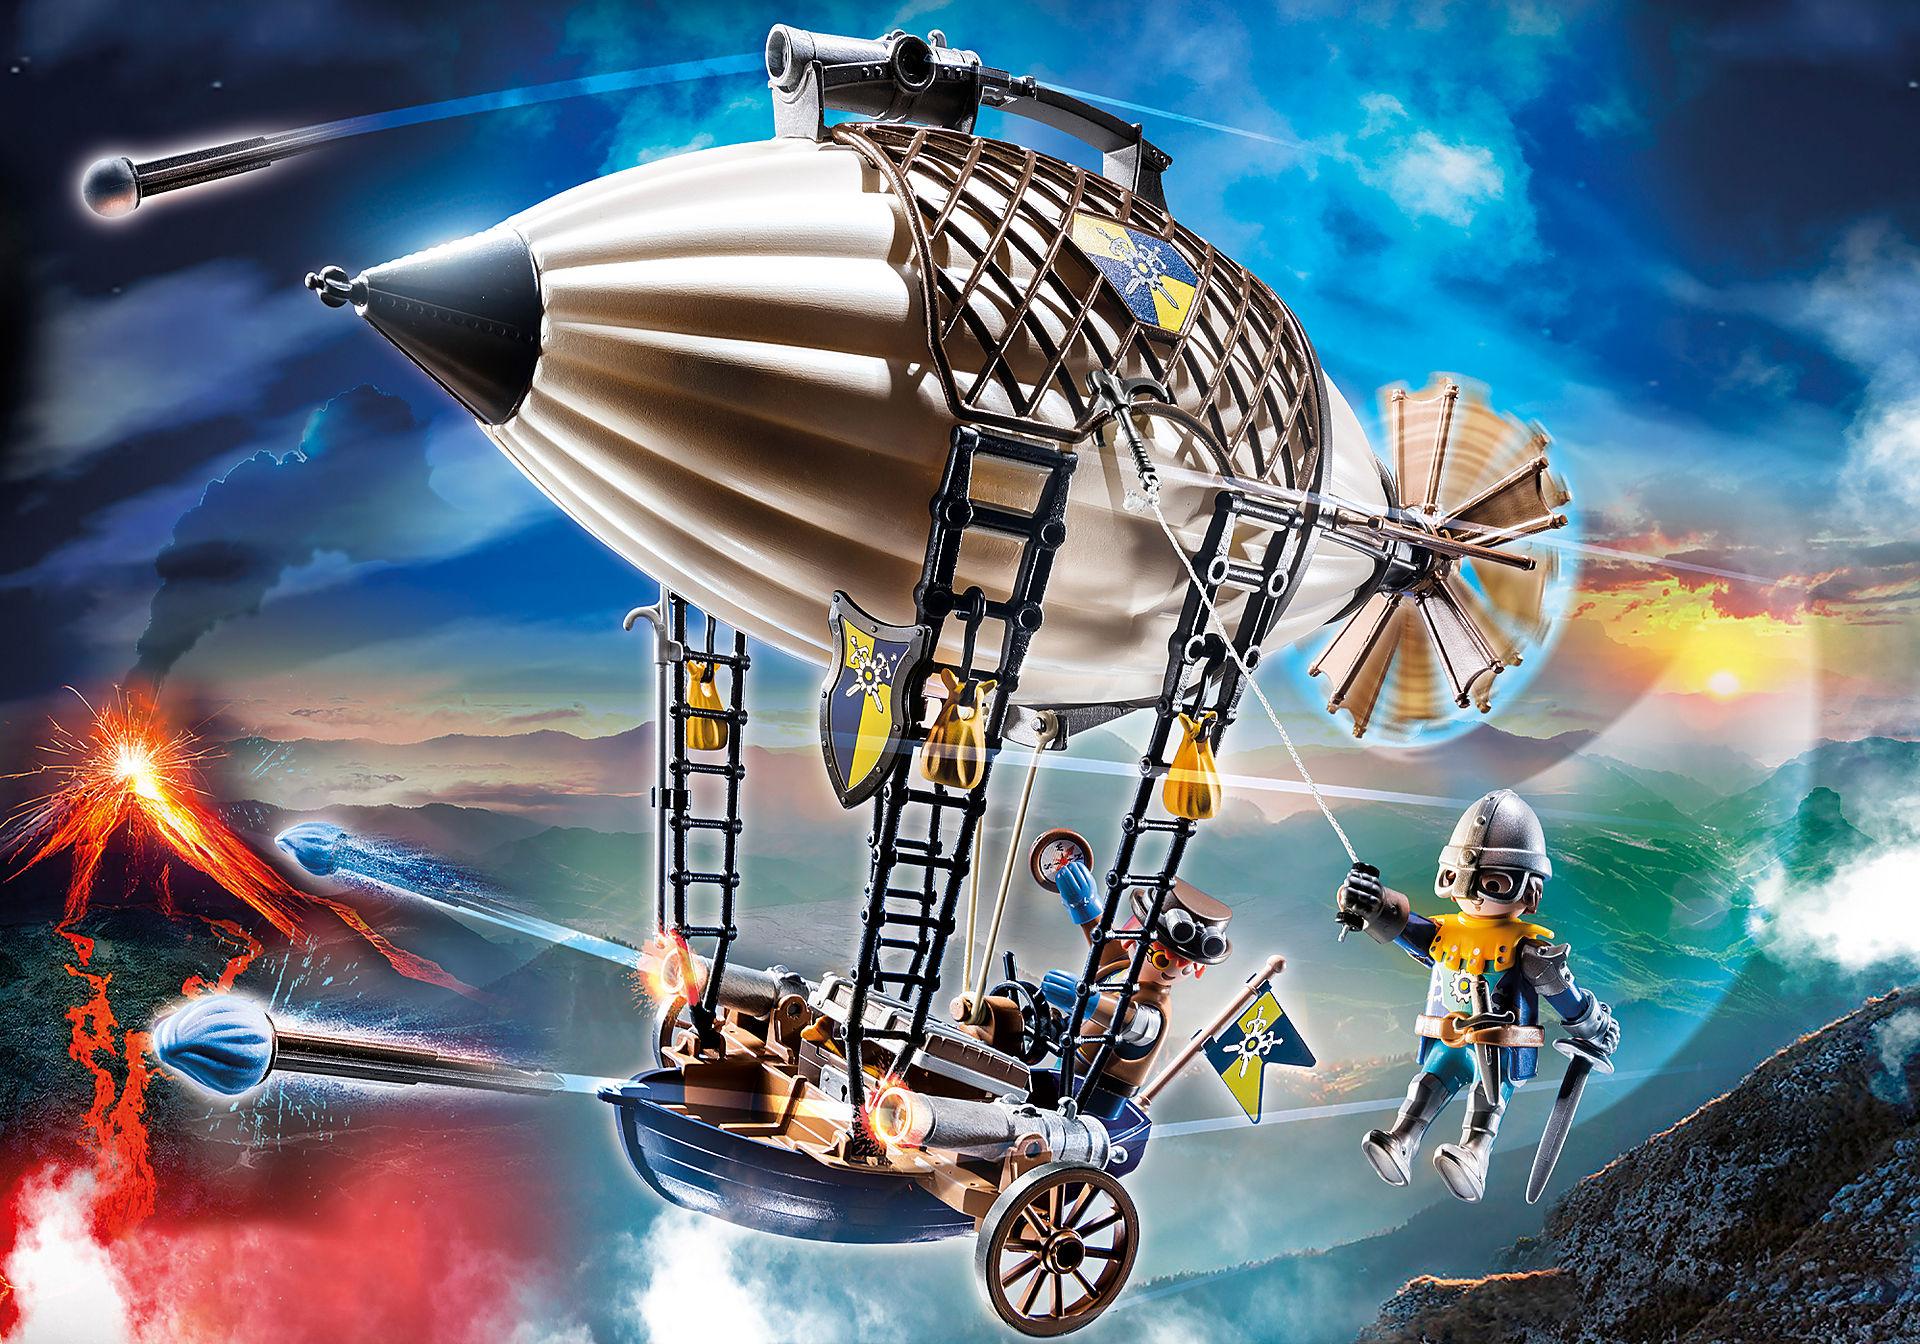 70642 Zeppelin Novelmore de Dario zoom image1